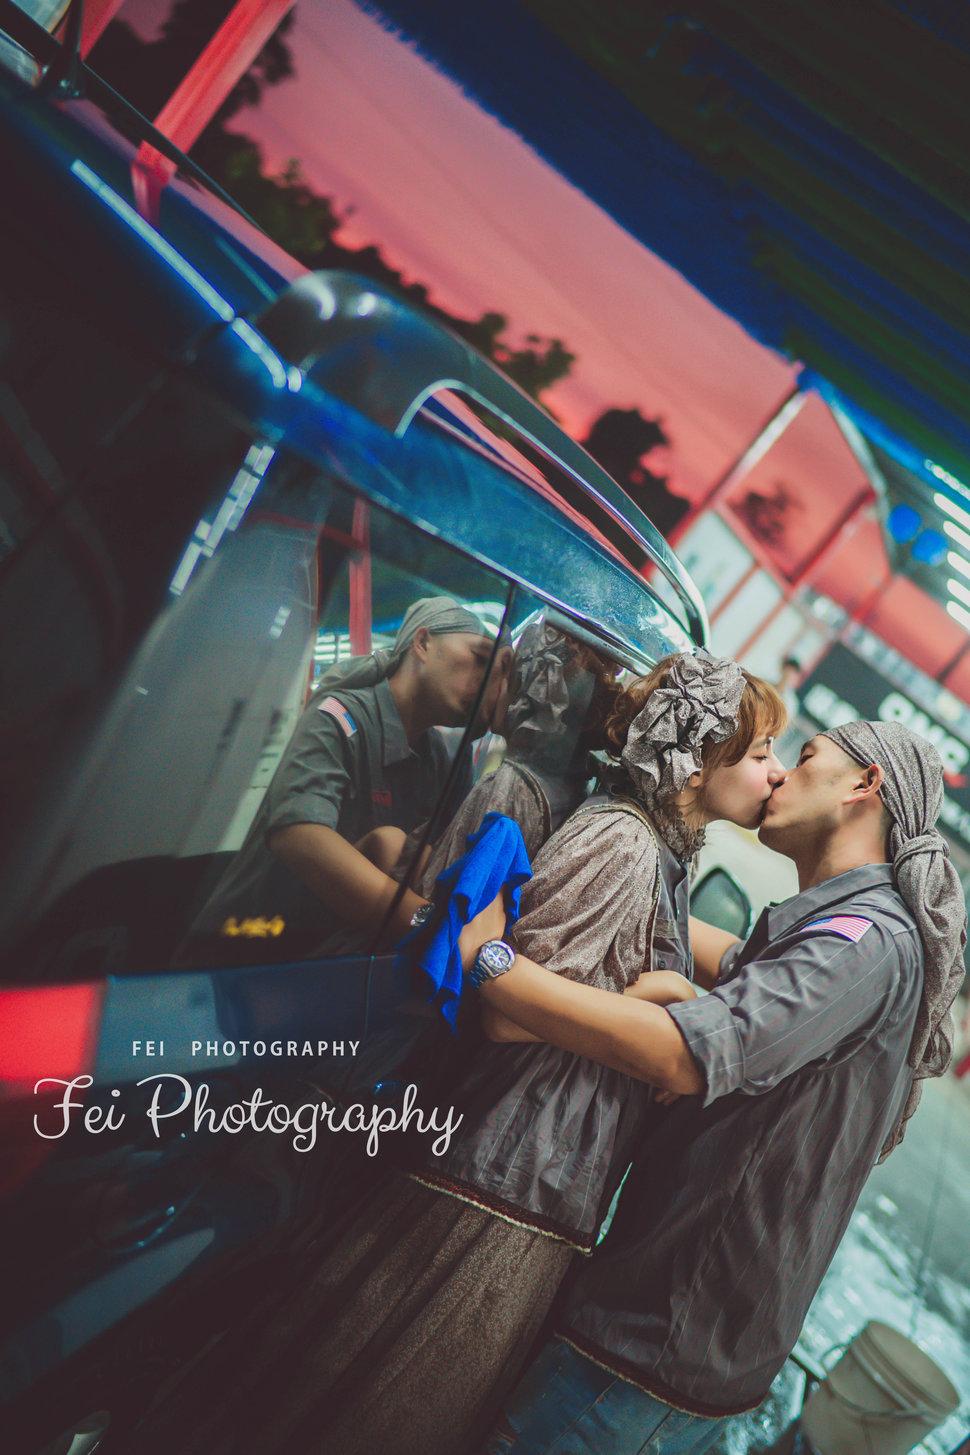 9 - 飛妃 Photography/女攝影師《結婚吧》